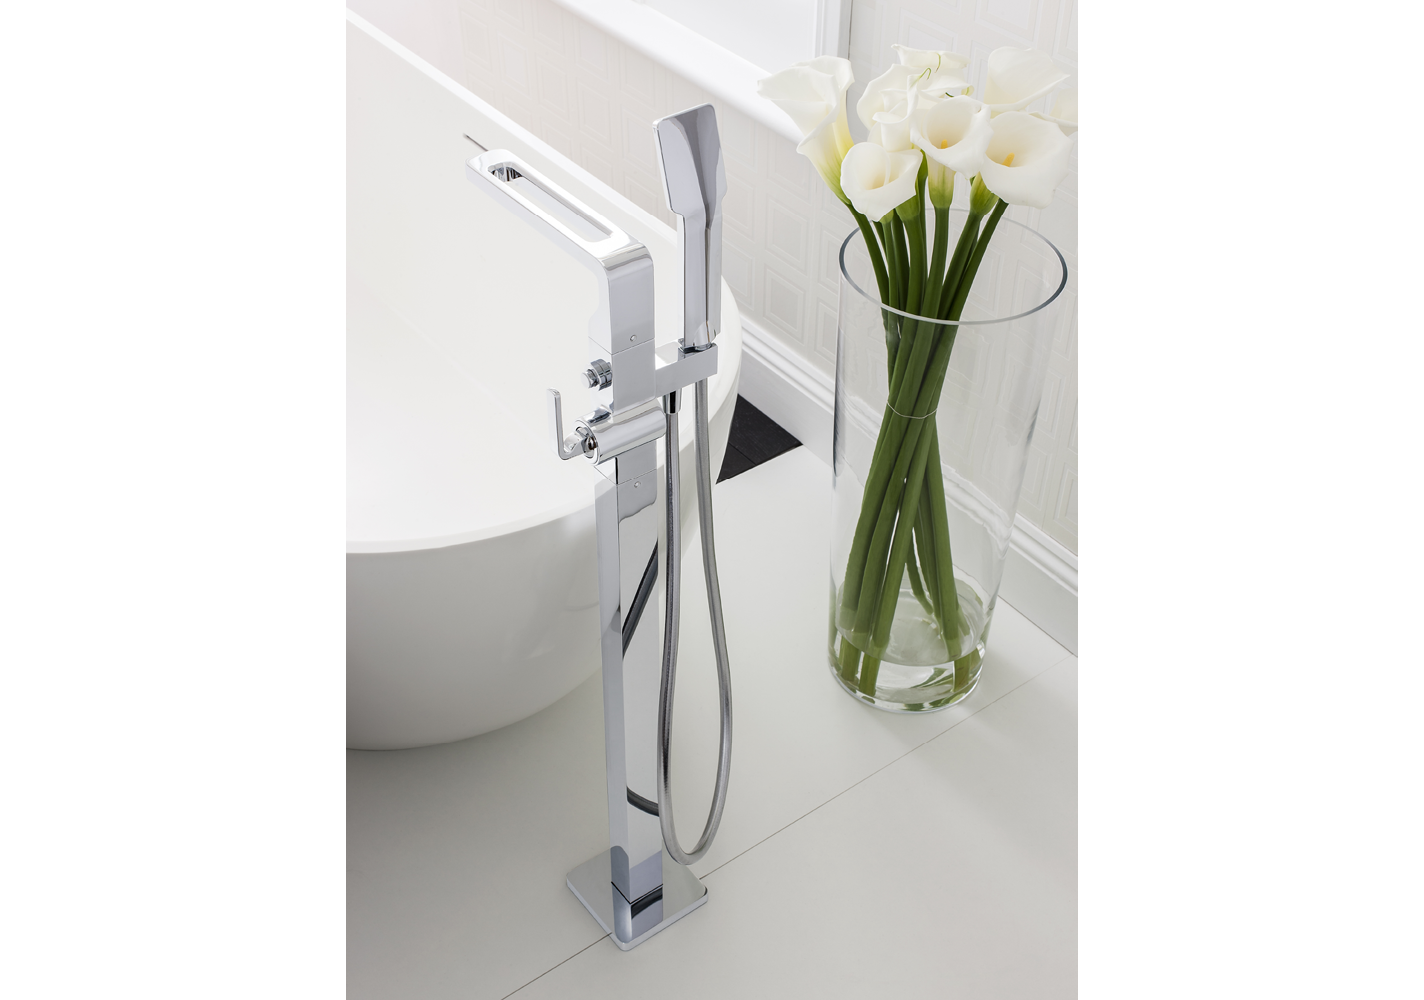 Kelly hoppen luxury bathrooms uk crosswater holdings reviewsmspy